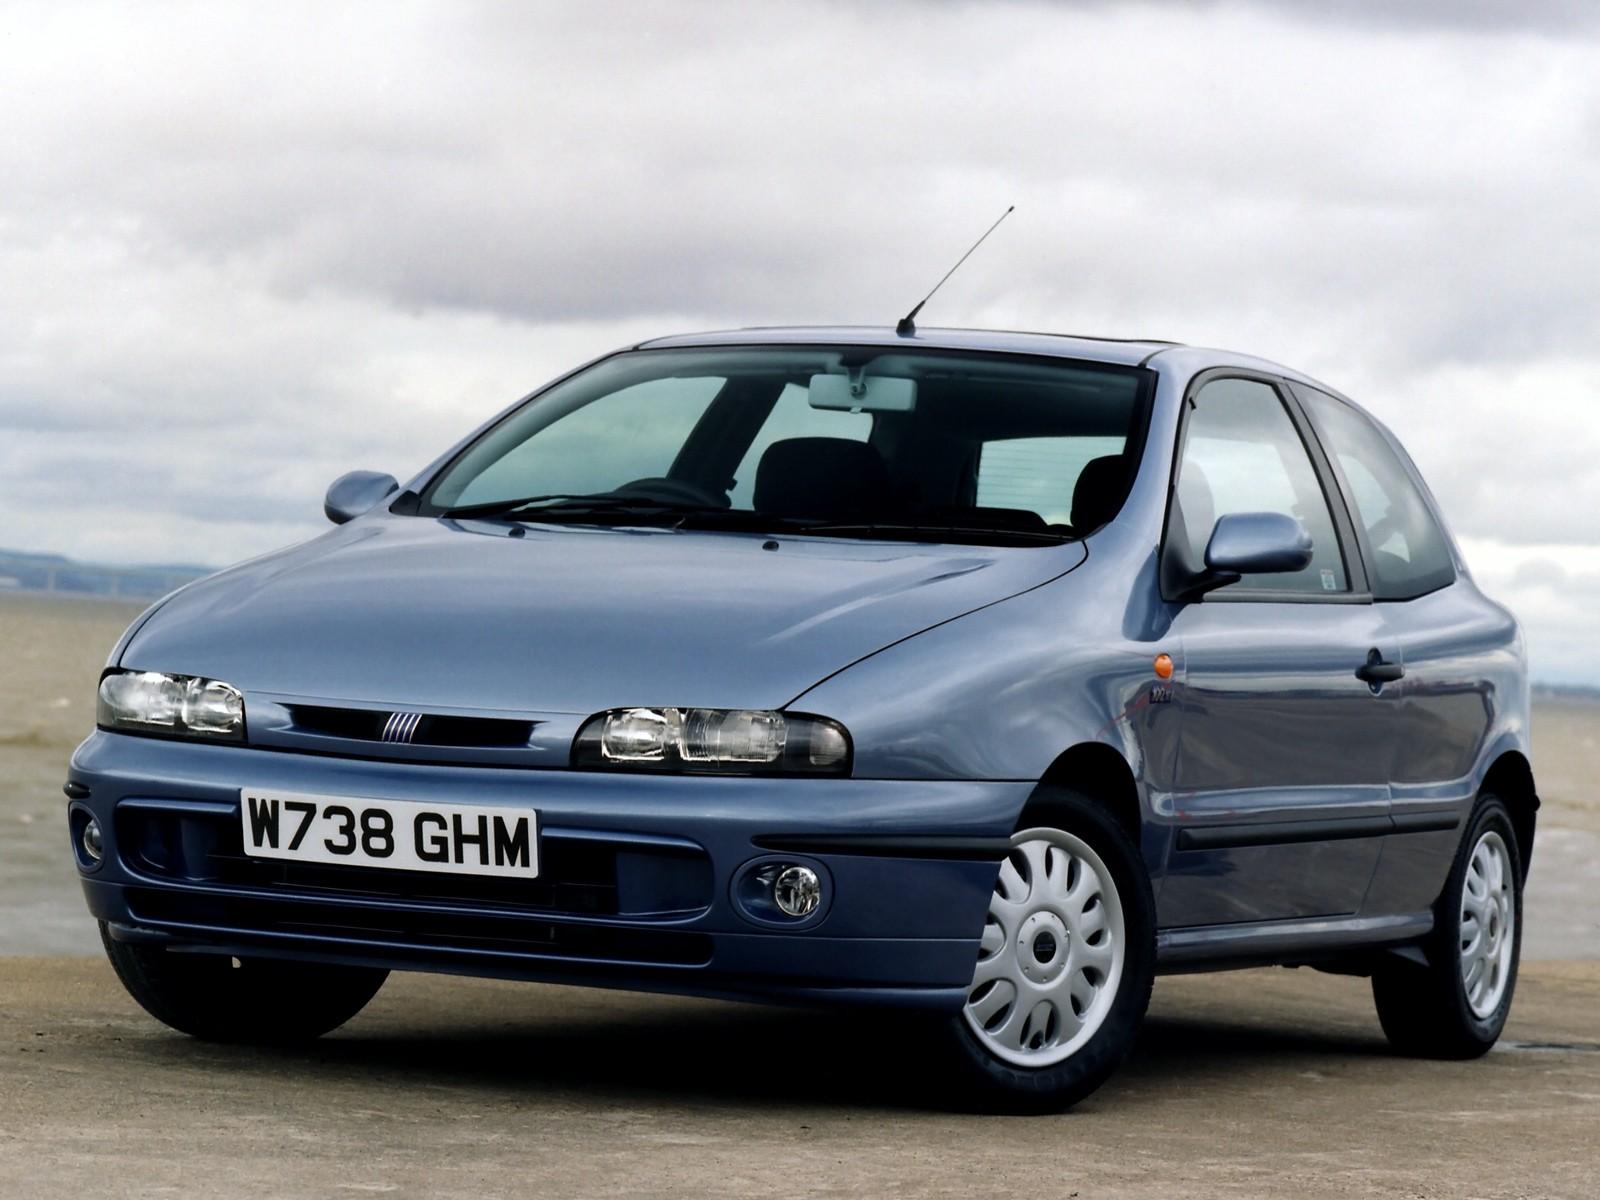 Fiat Bravo 1995 1996 1997 1998 1999 2000 2001